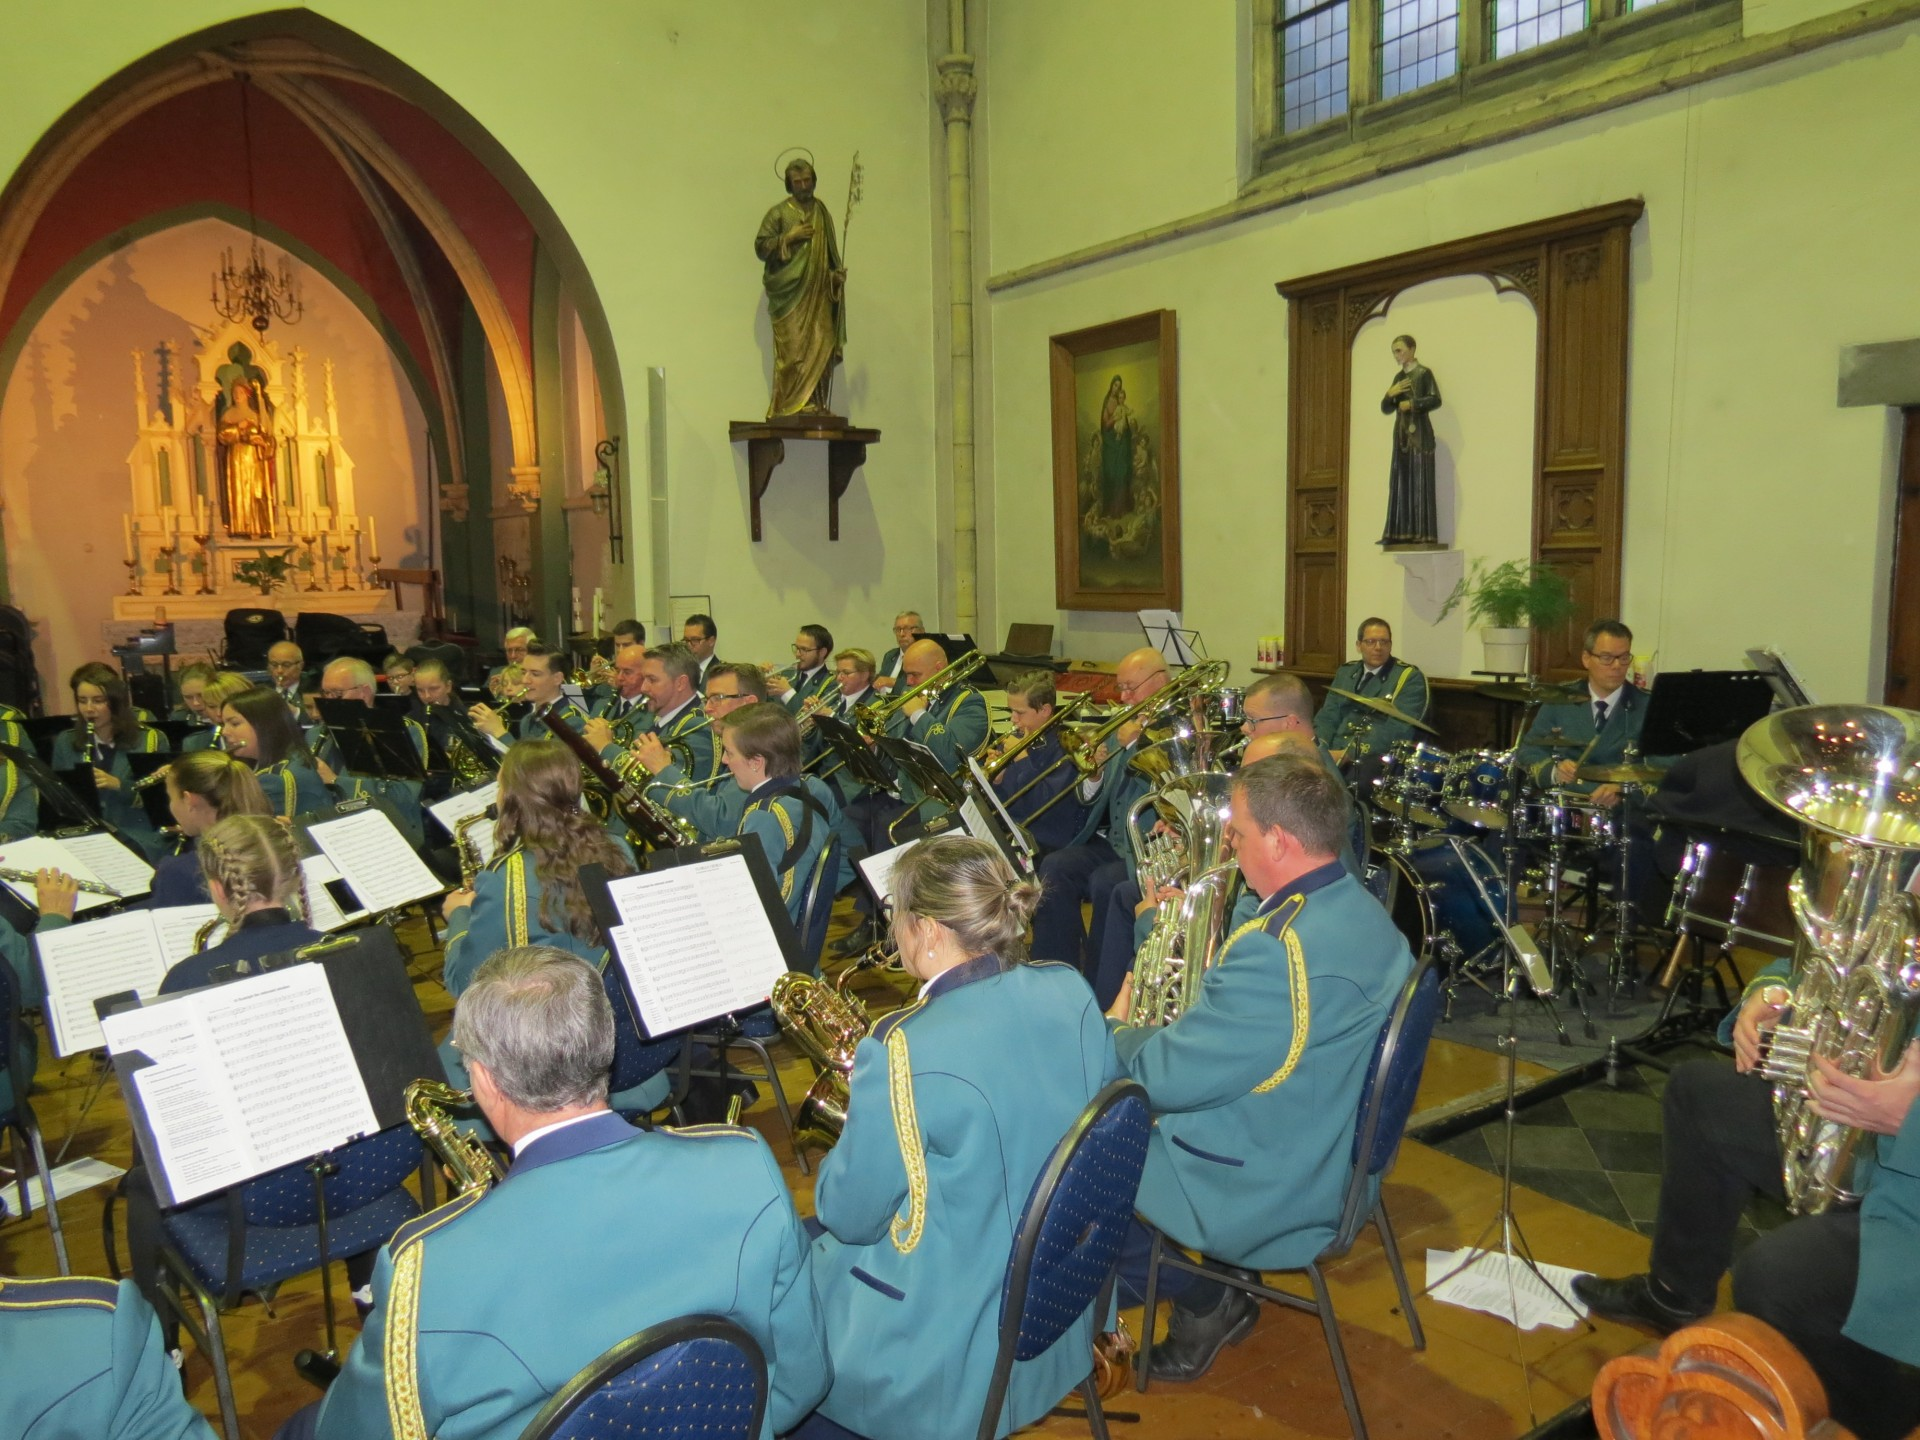 Walburga dag van de Harmonie Sint Walburga, op zaterdag 11 mei om 19:00 uur